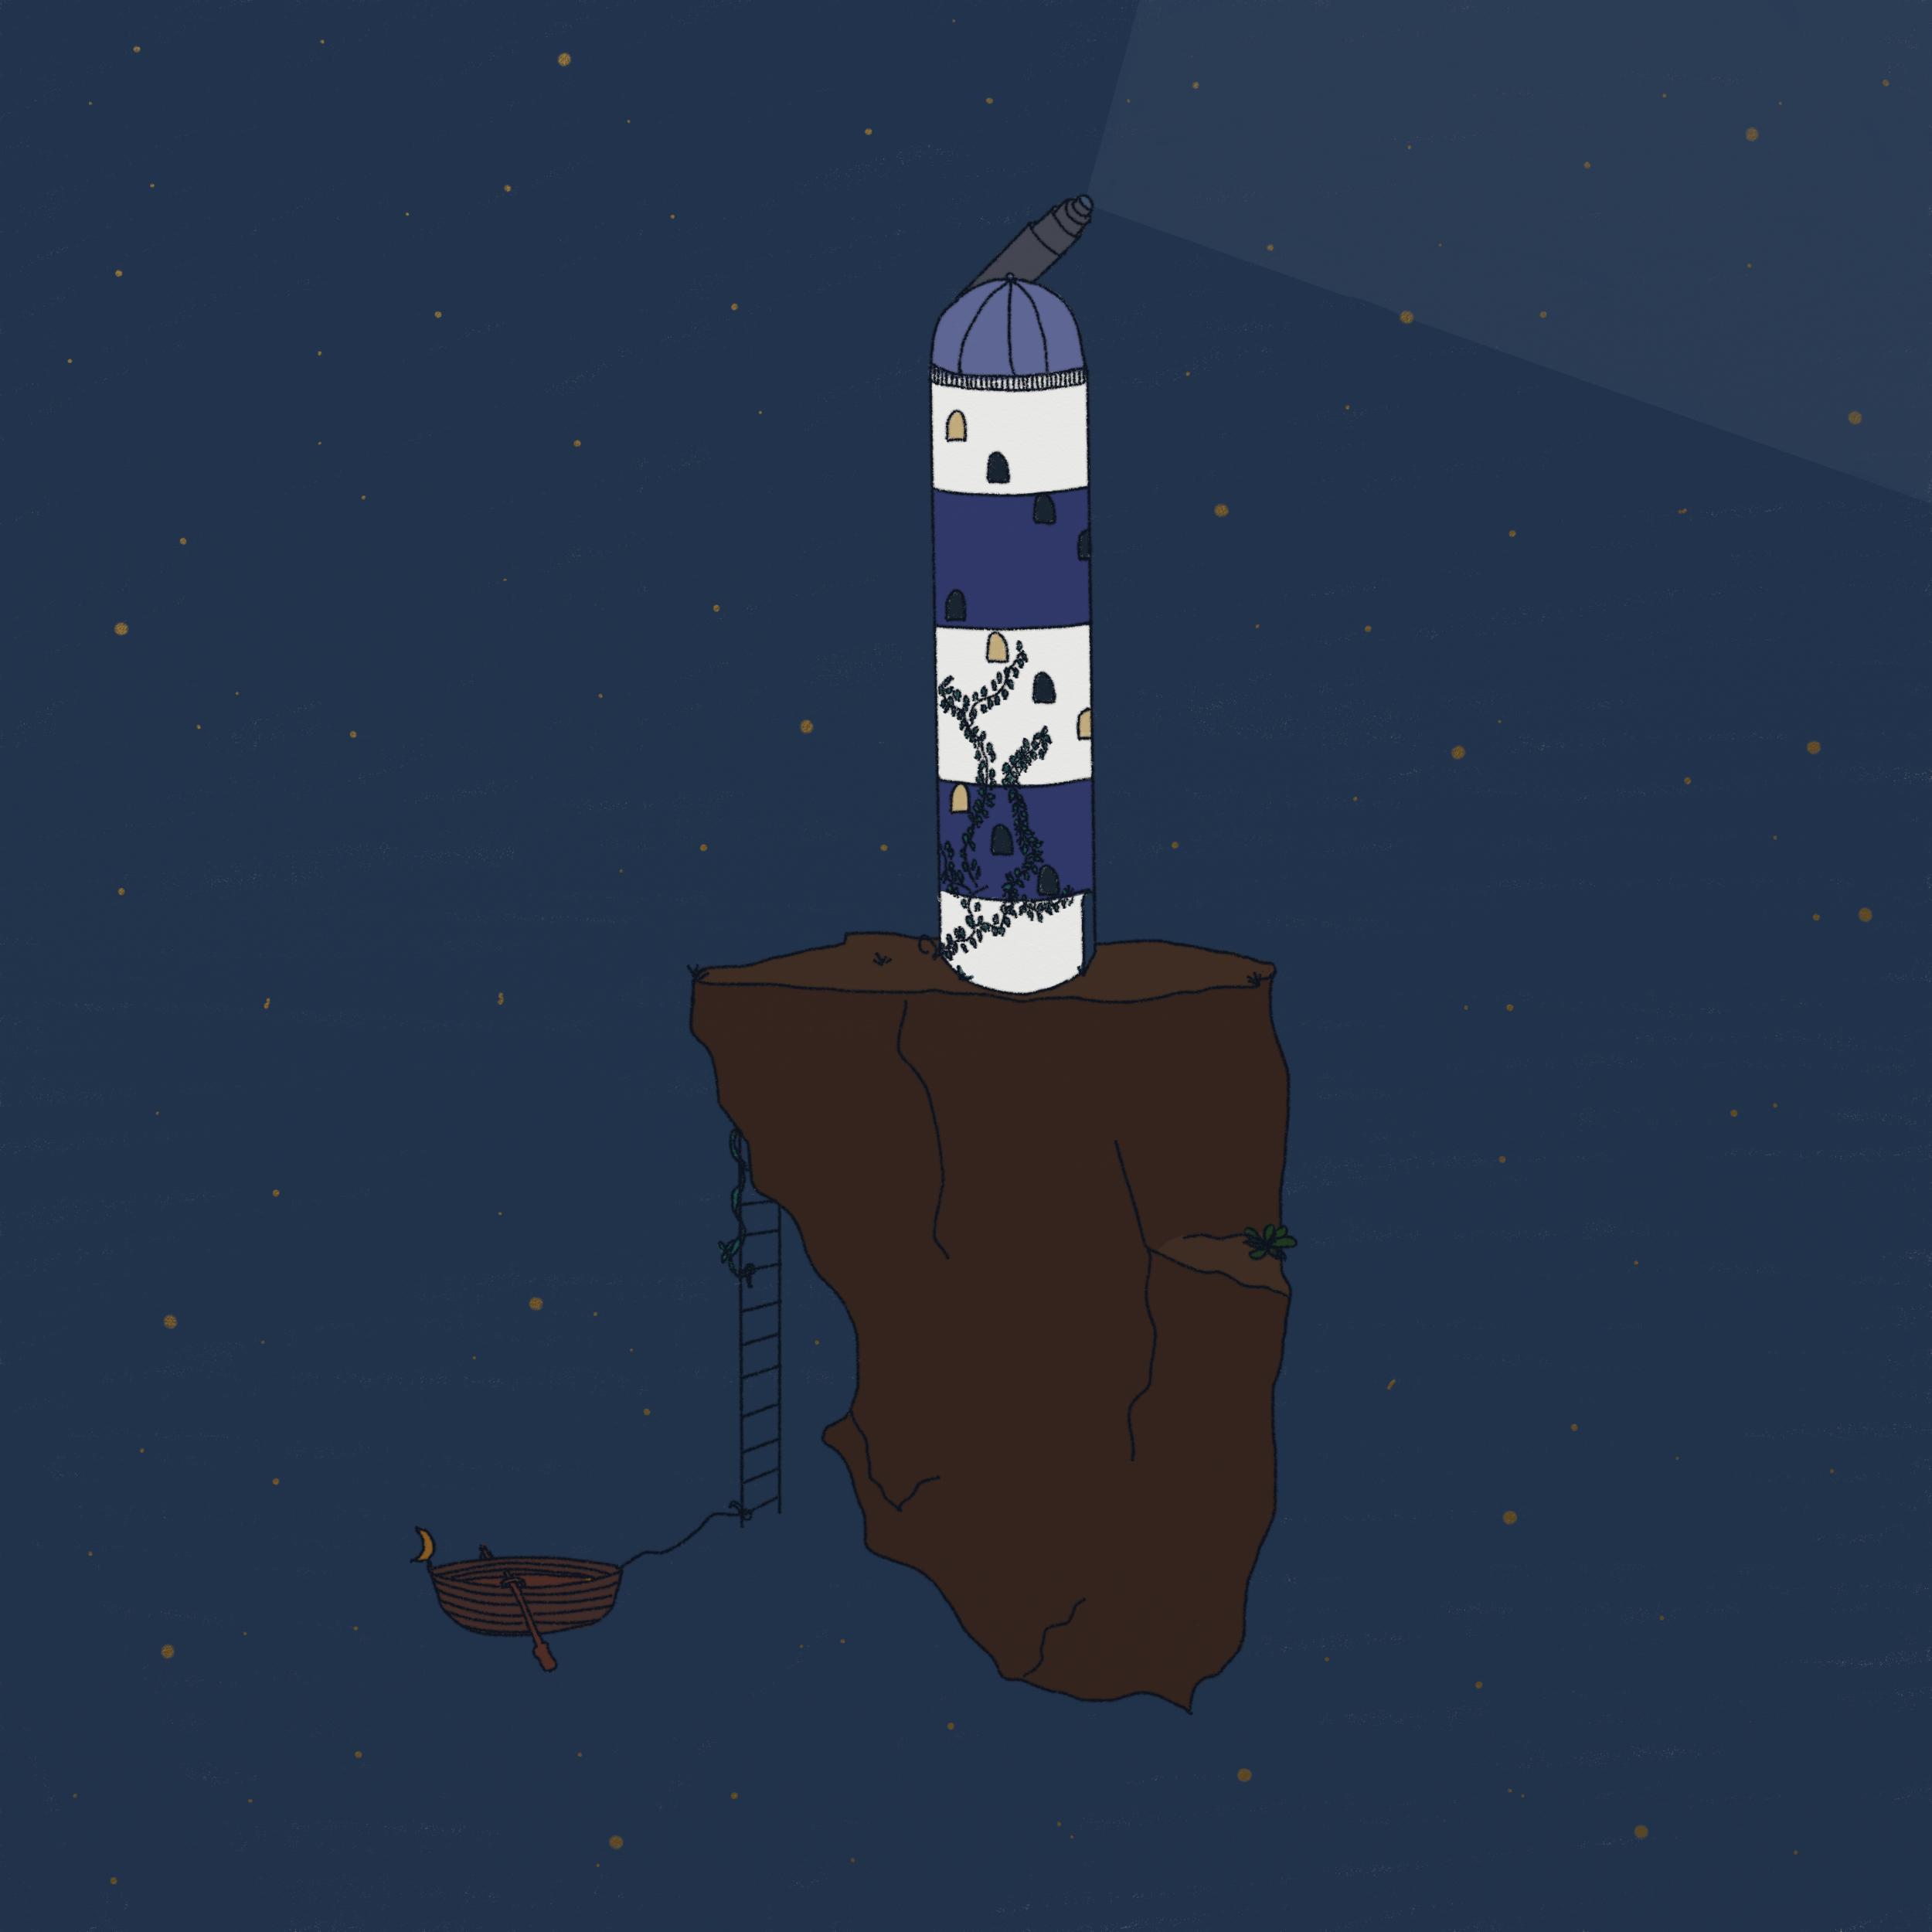 L'observatoire _3.png